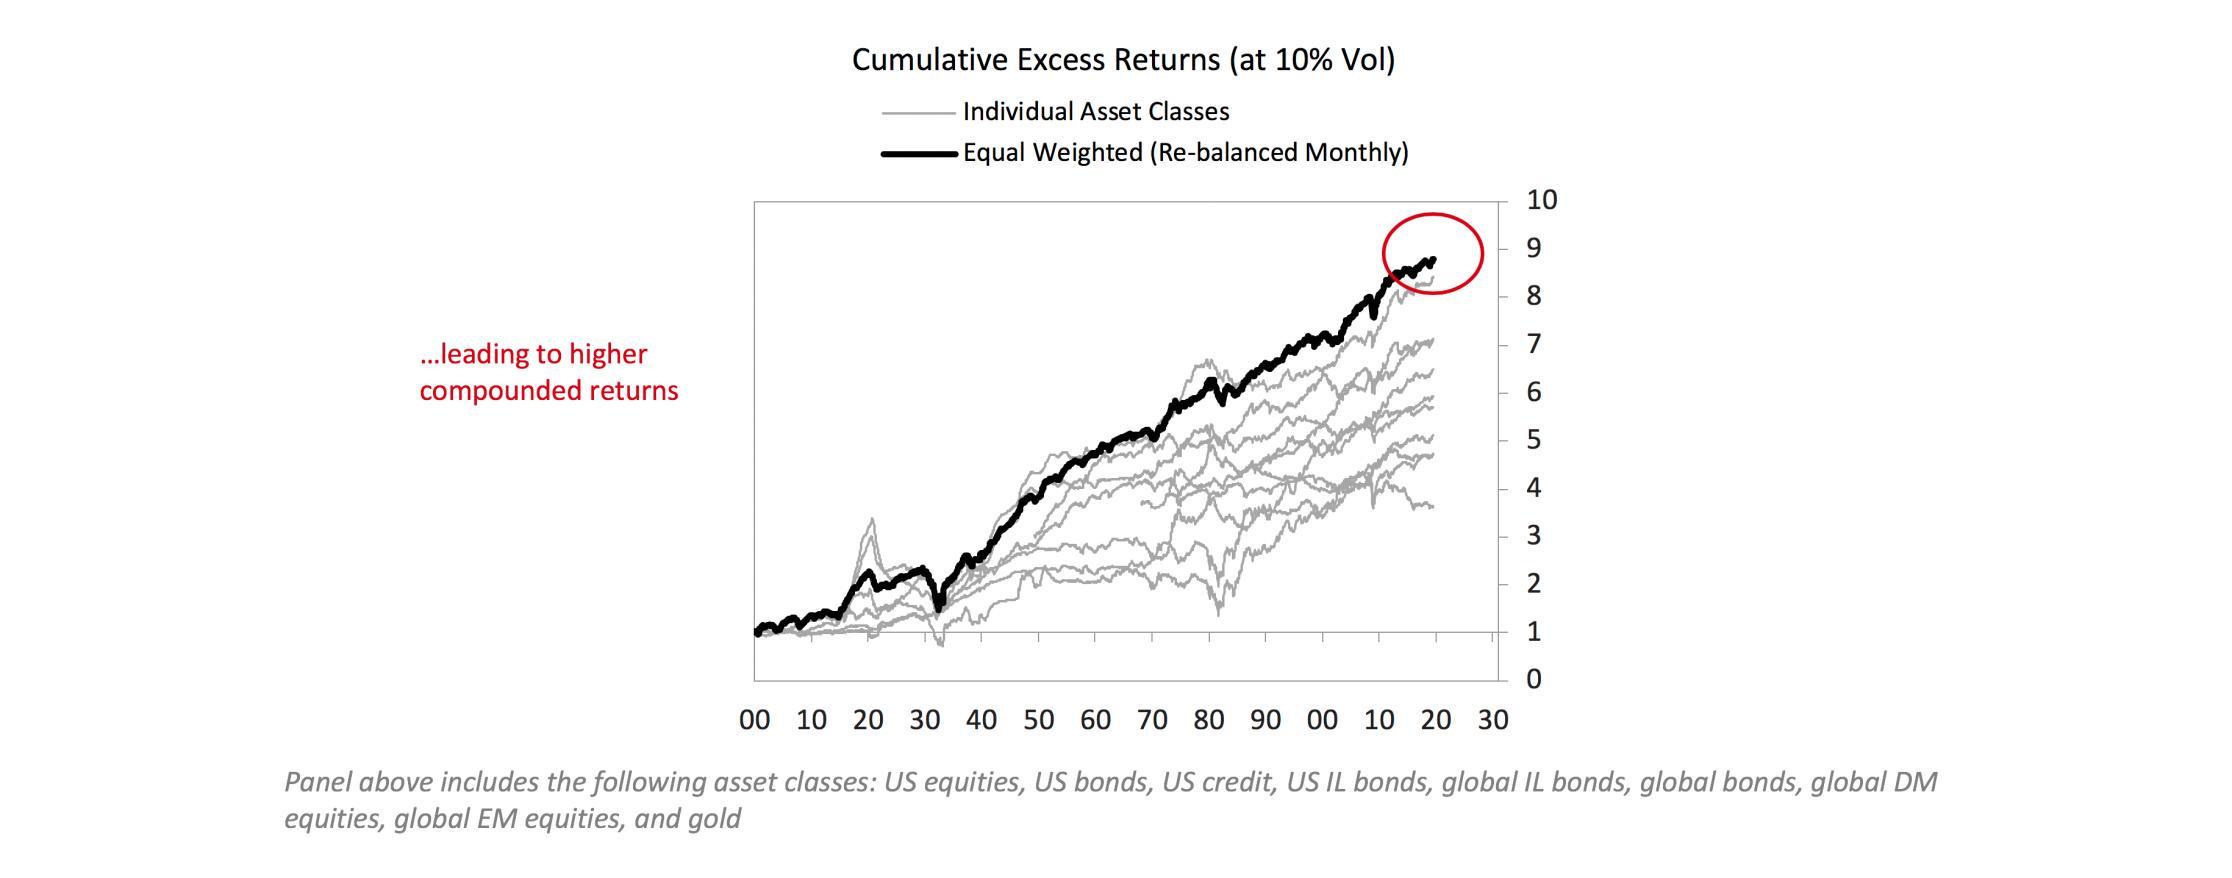 Diversification between asset classes